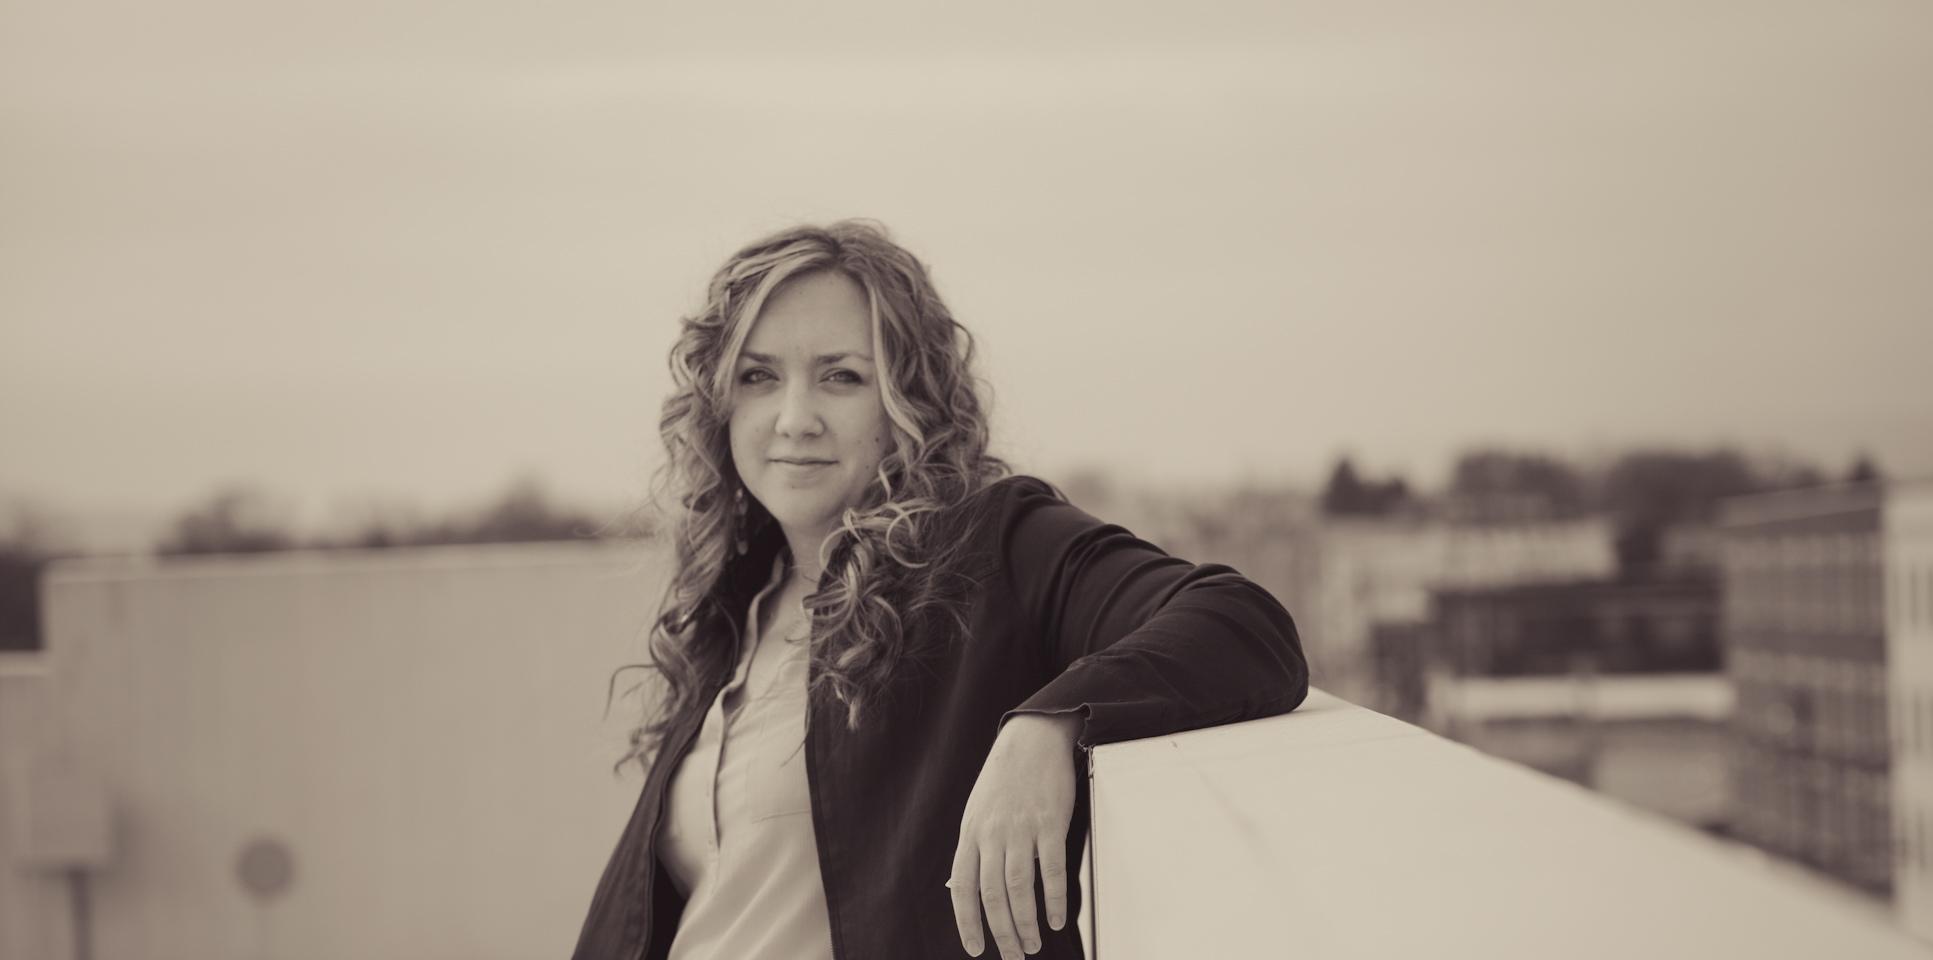 Amy Cox Photo Shoot Parking Garage Roanoke.jpg